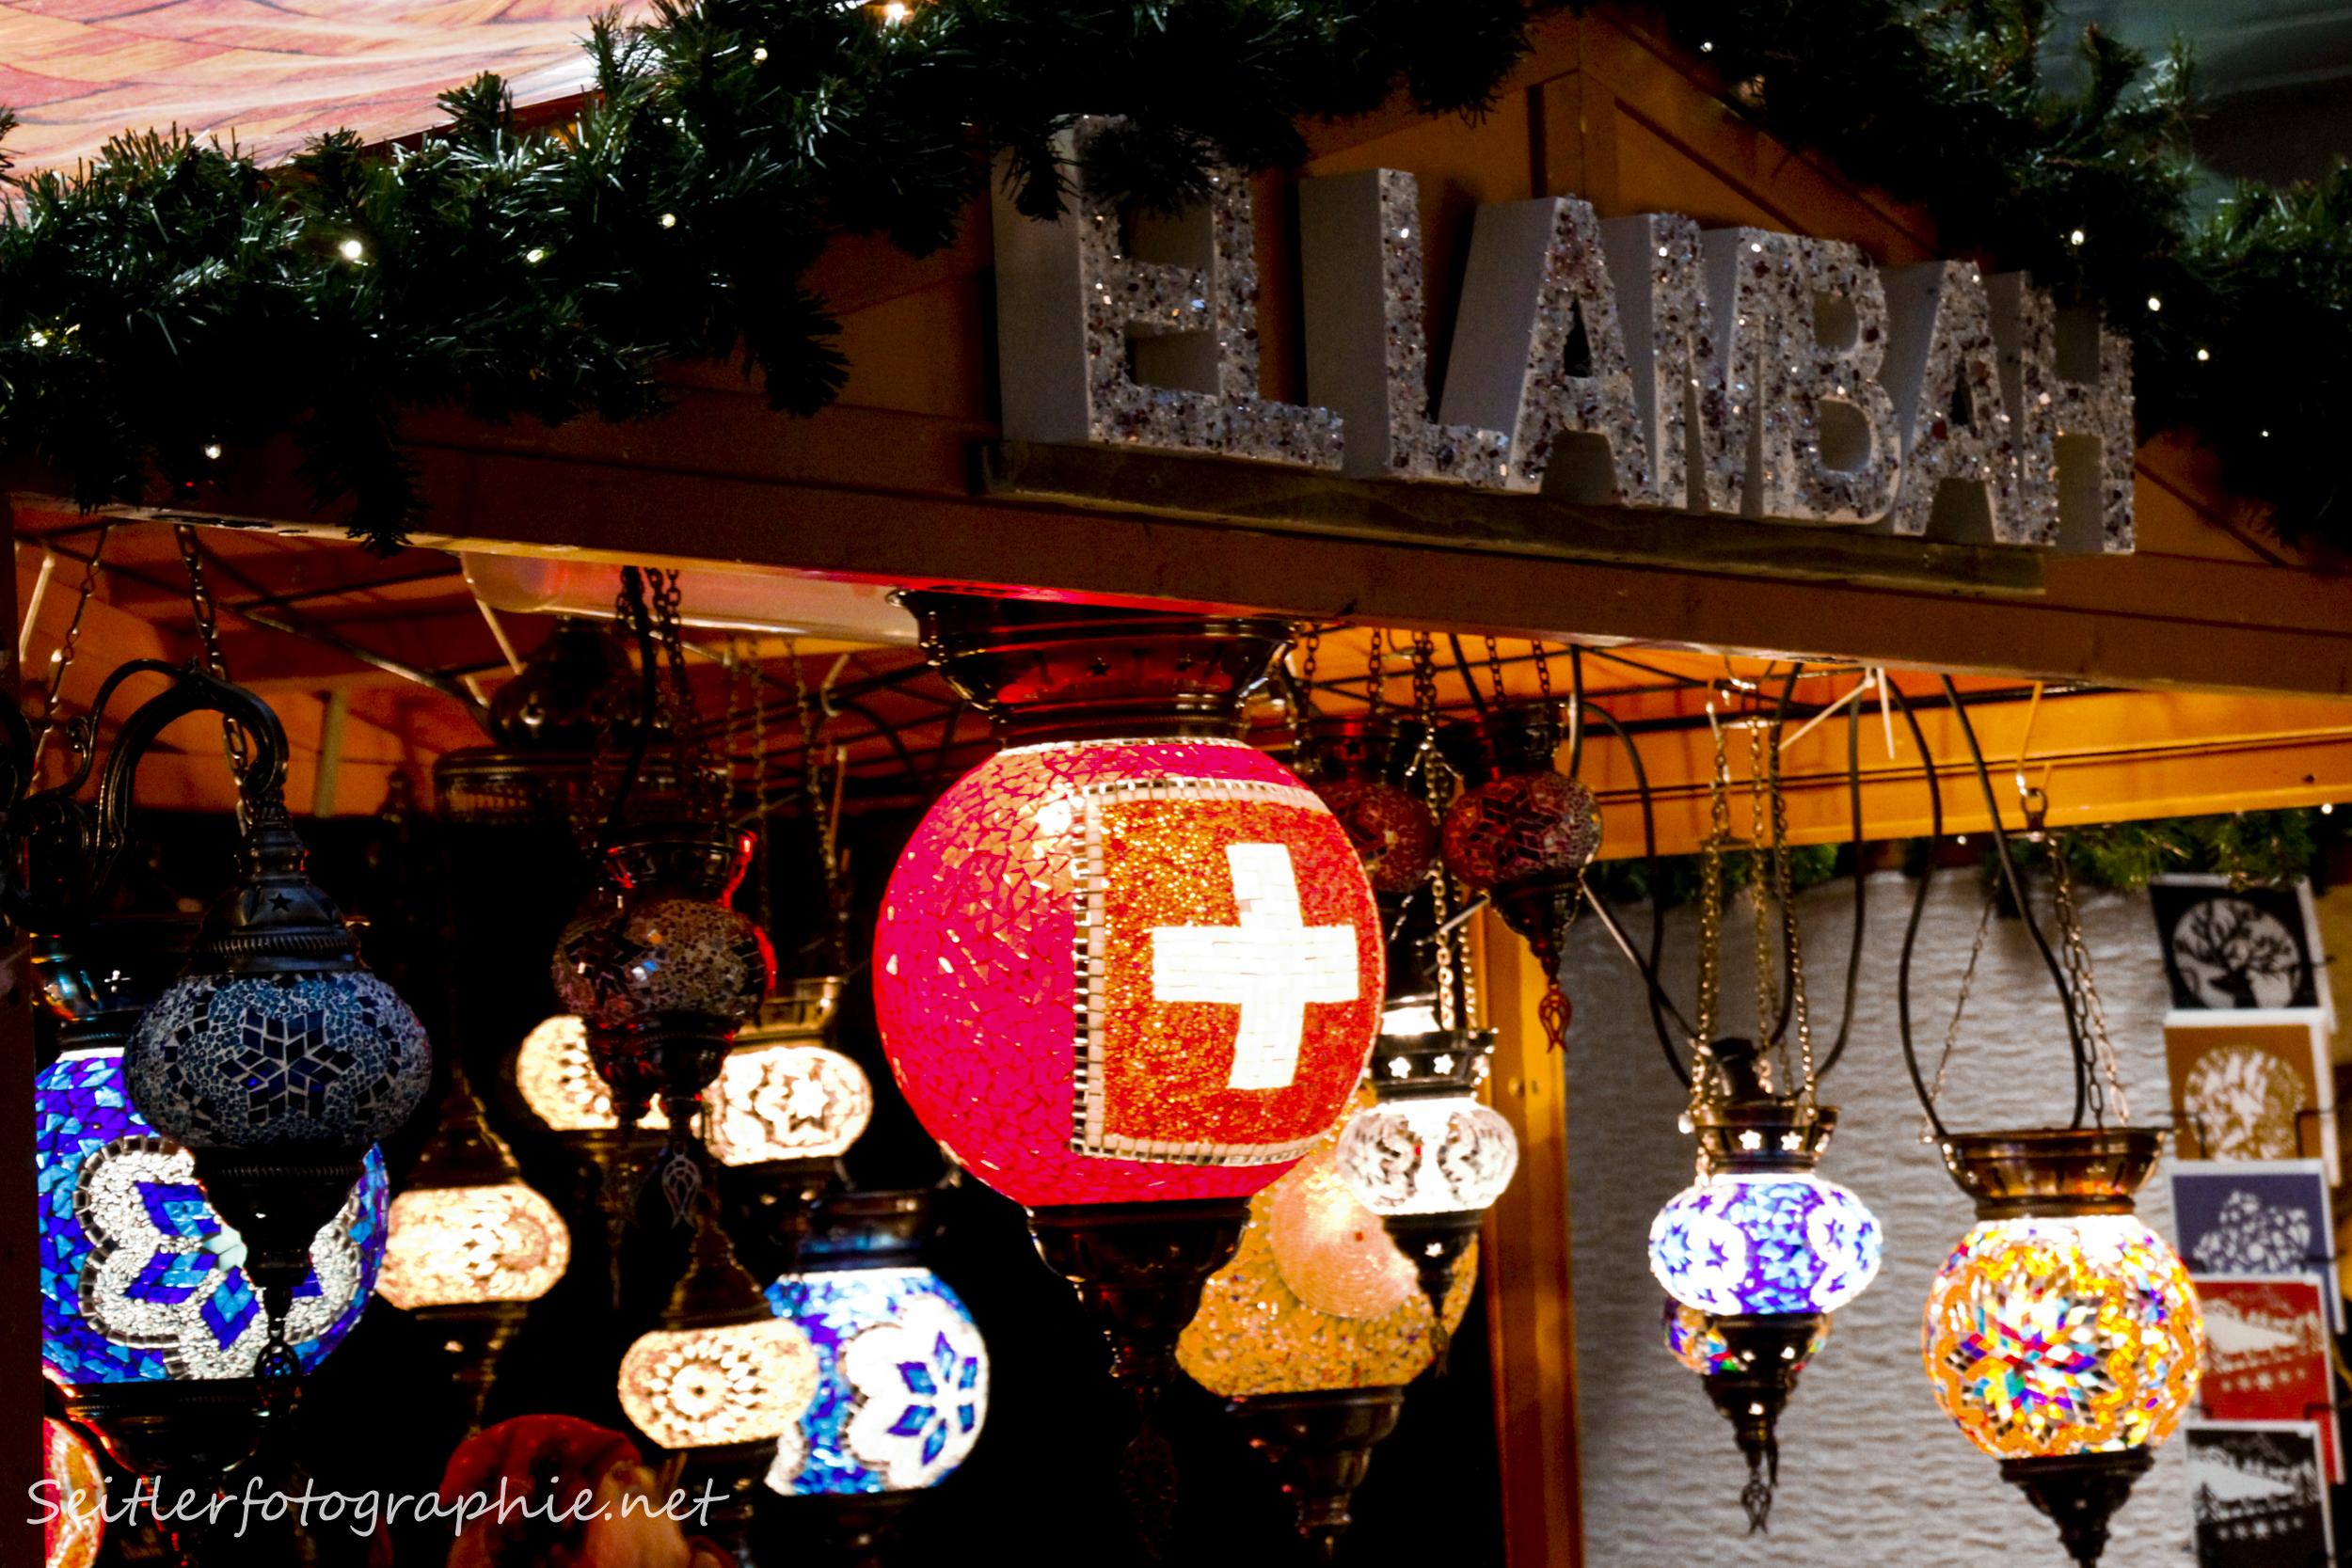 20161127_weihnachtsmarkt_joannarutkoseitler_14